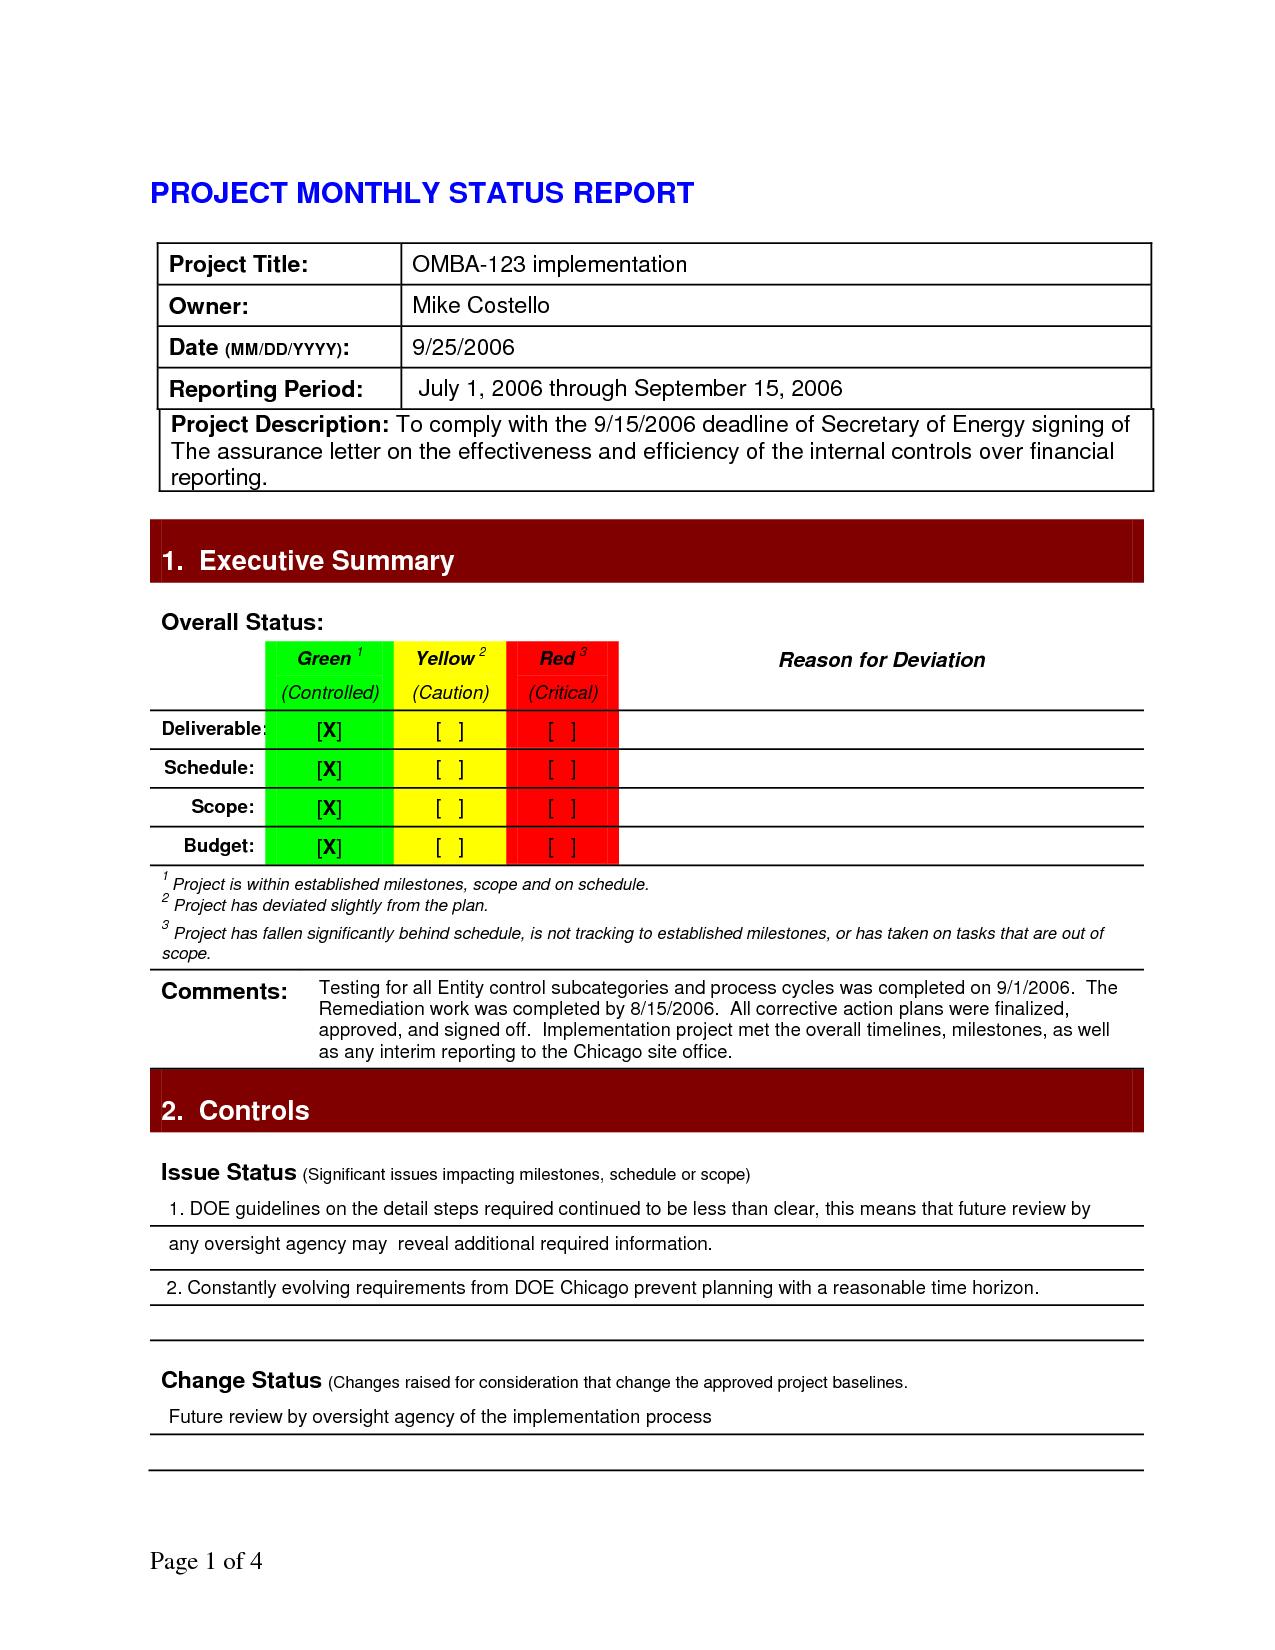 008 Weekly Status Report Template Excel Astounding Ideas In Project Status Report Template Excel Download Filetype Xls